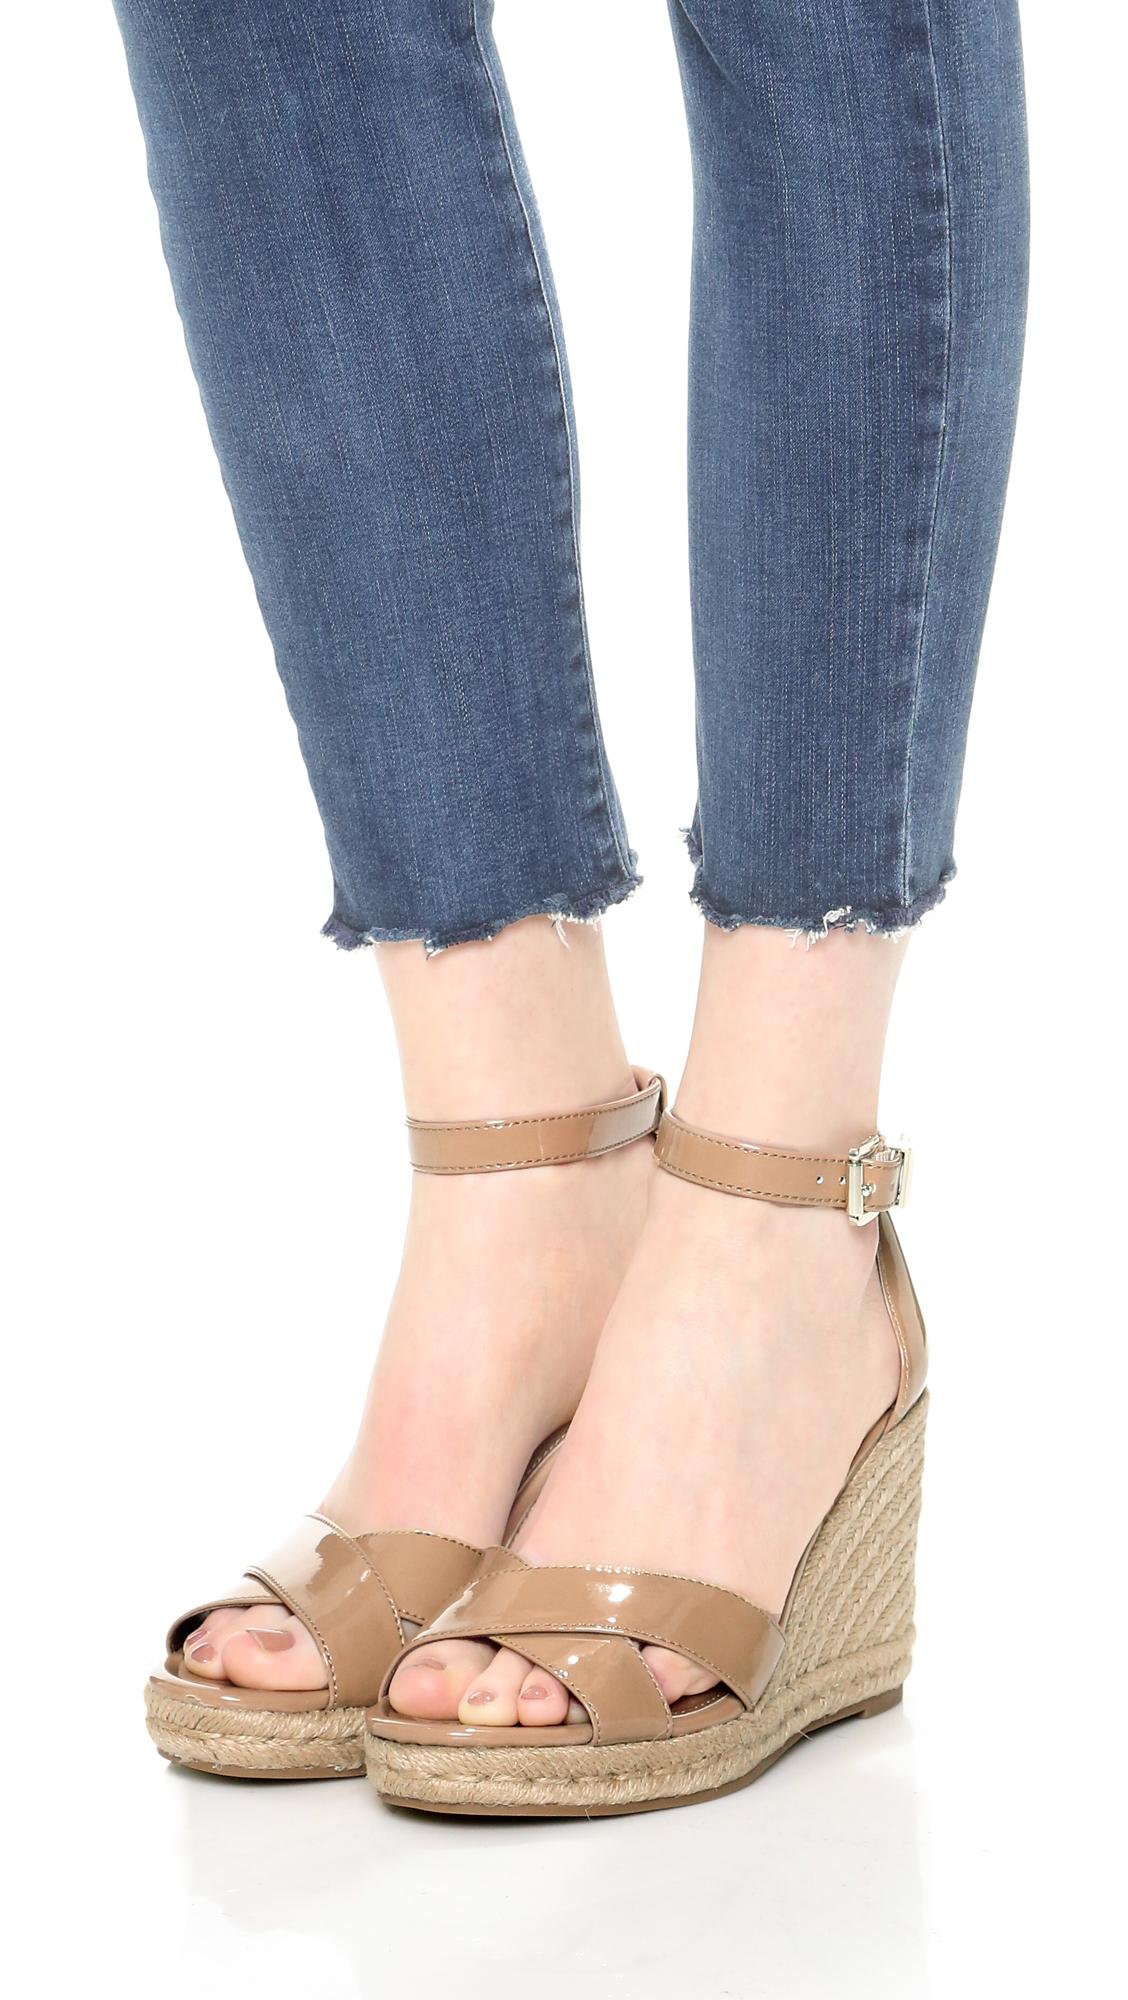 57e3a40e95b Sam Edelman Brenda Espadrille Wedge Sandals | SHOPBOP